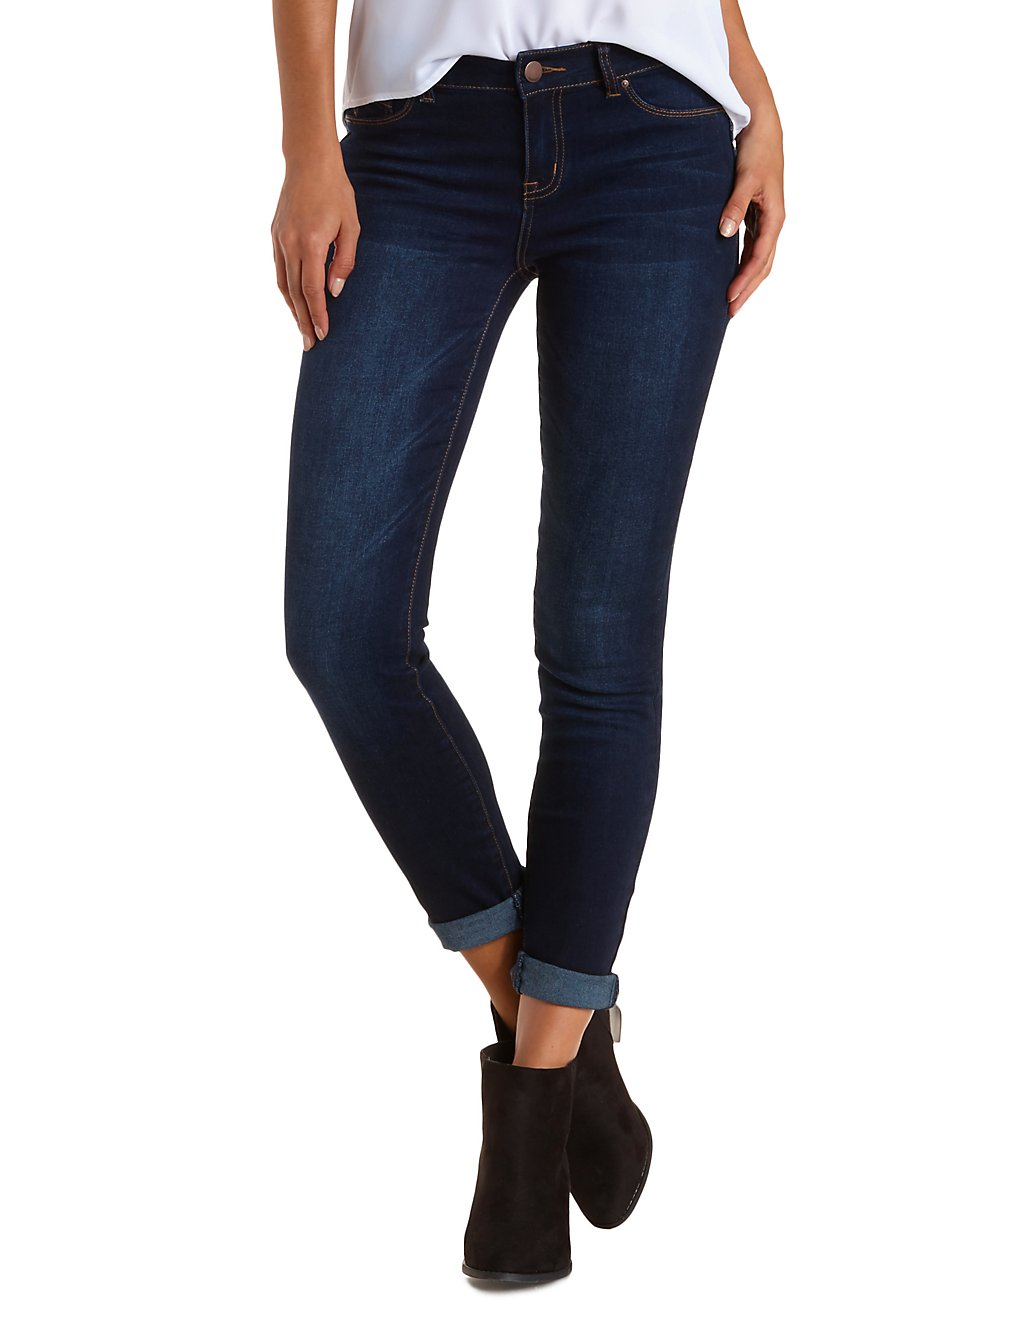 Charlotte Russe push up legging jeans